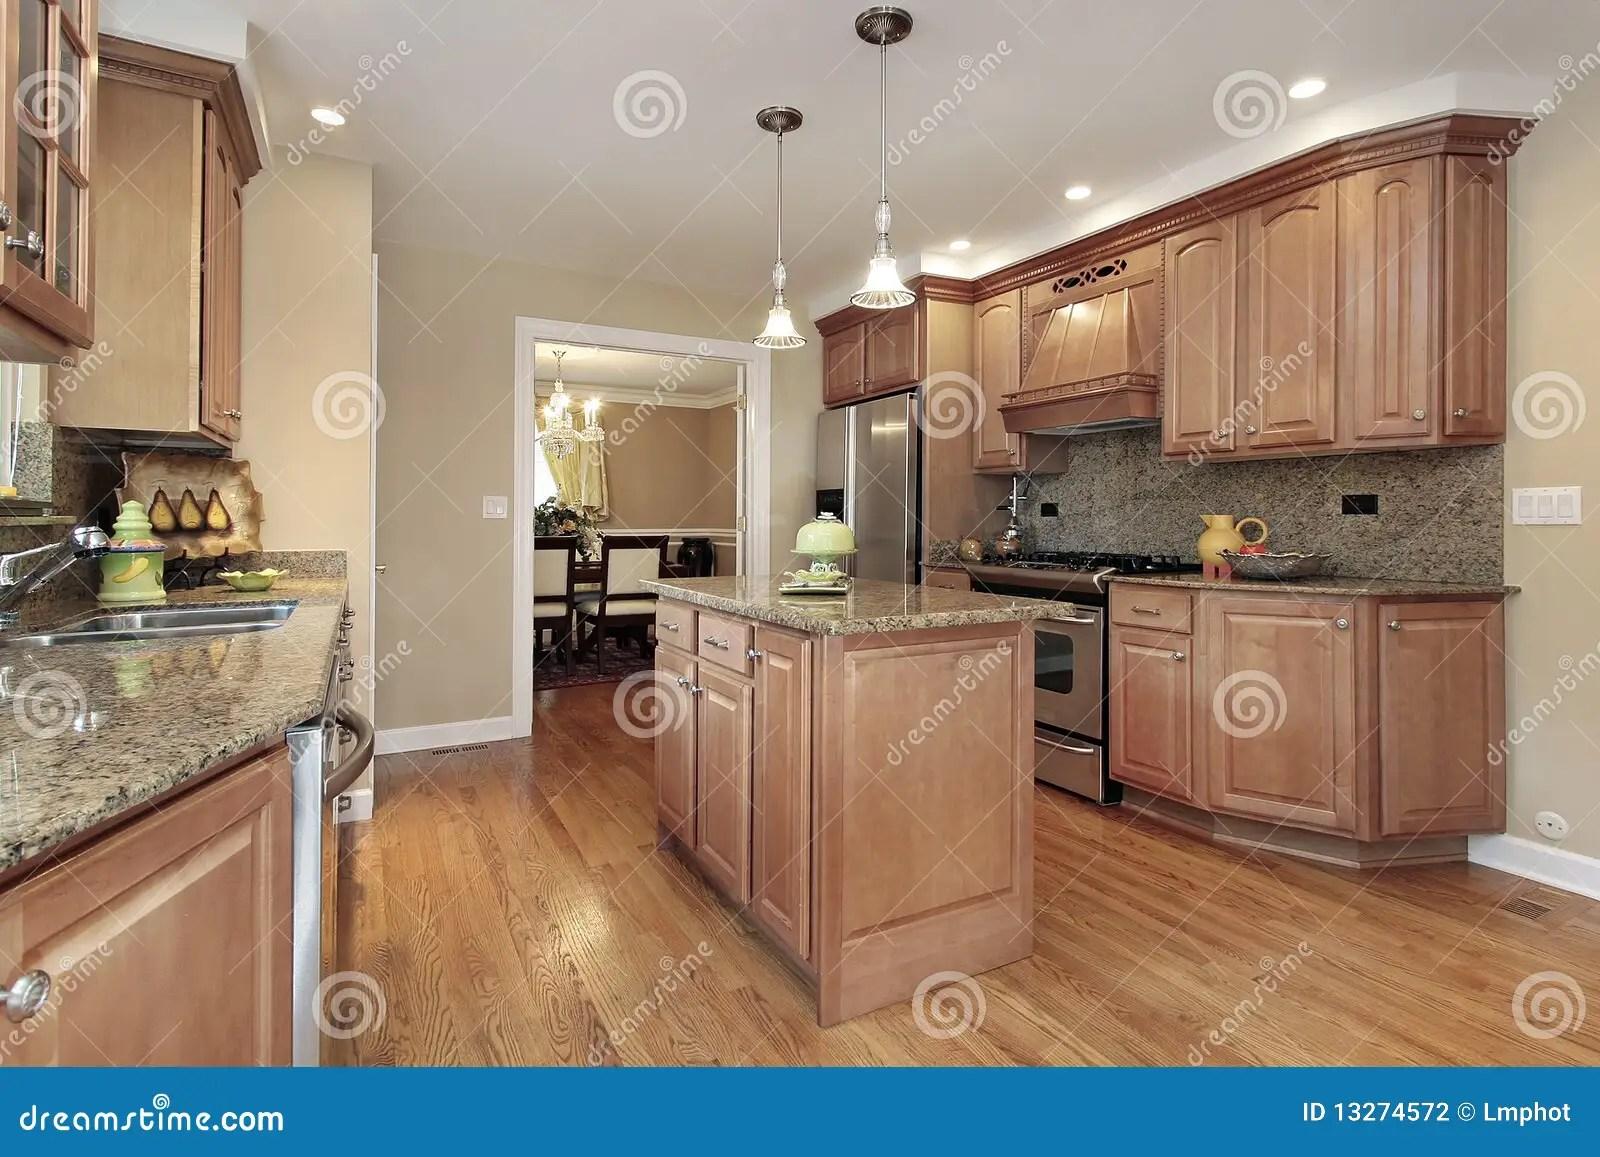 Luxury Home Furnishings And Decor